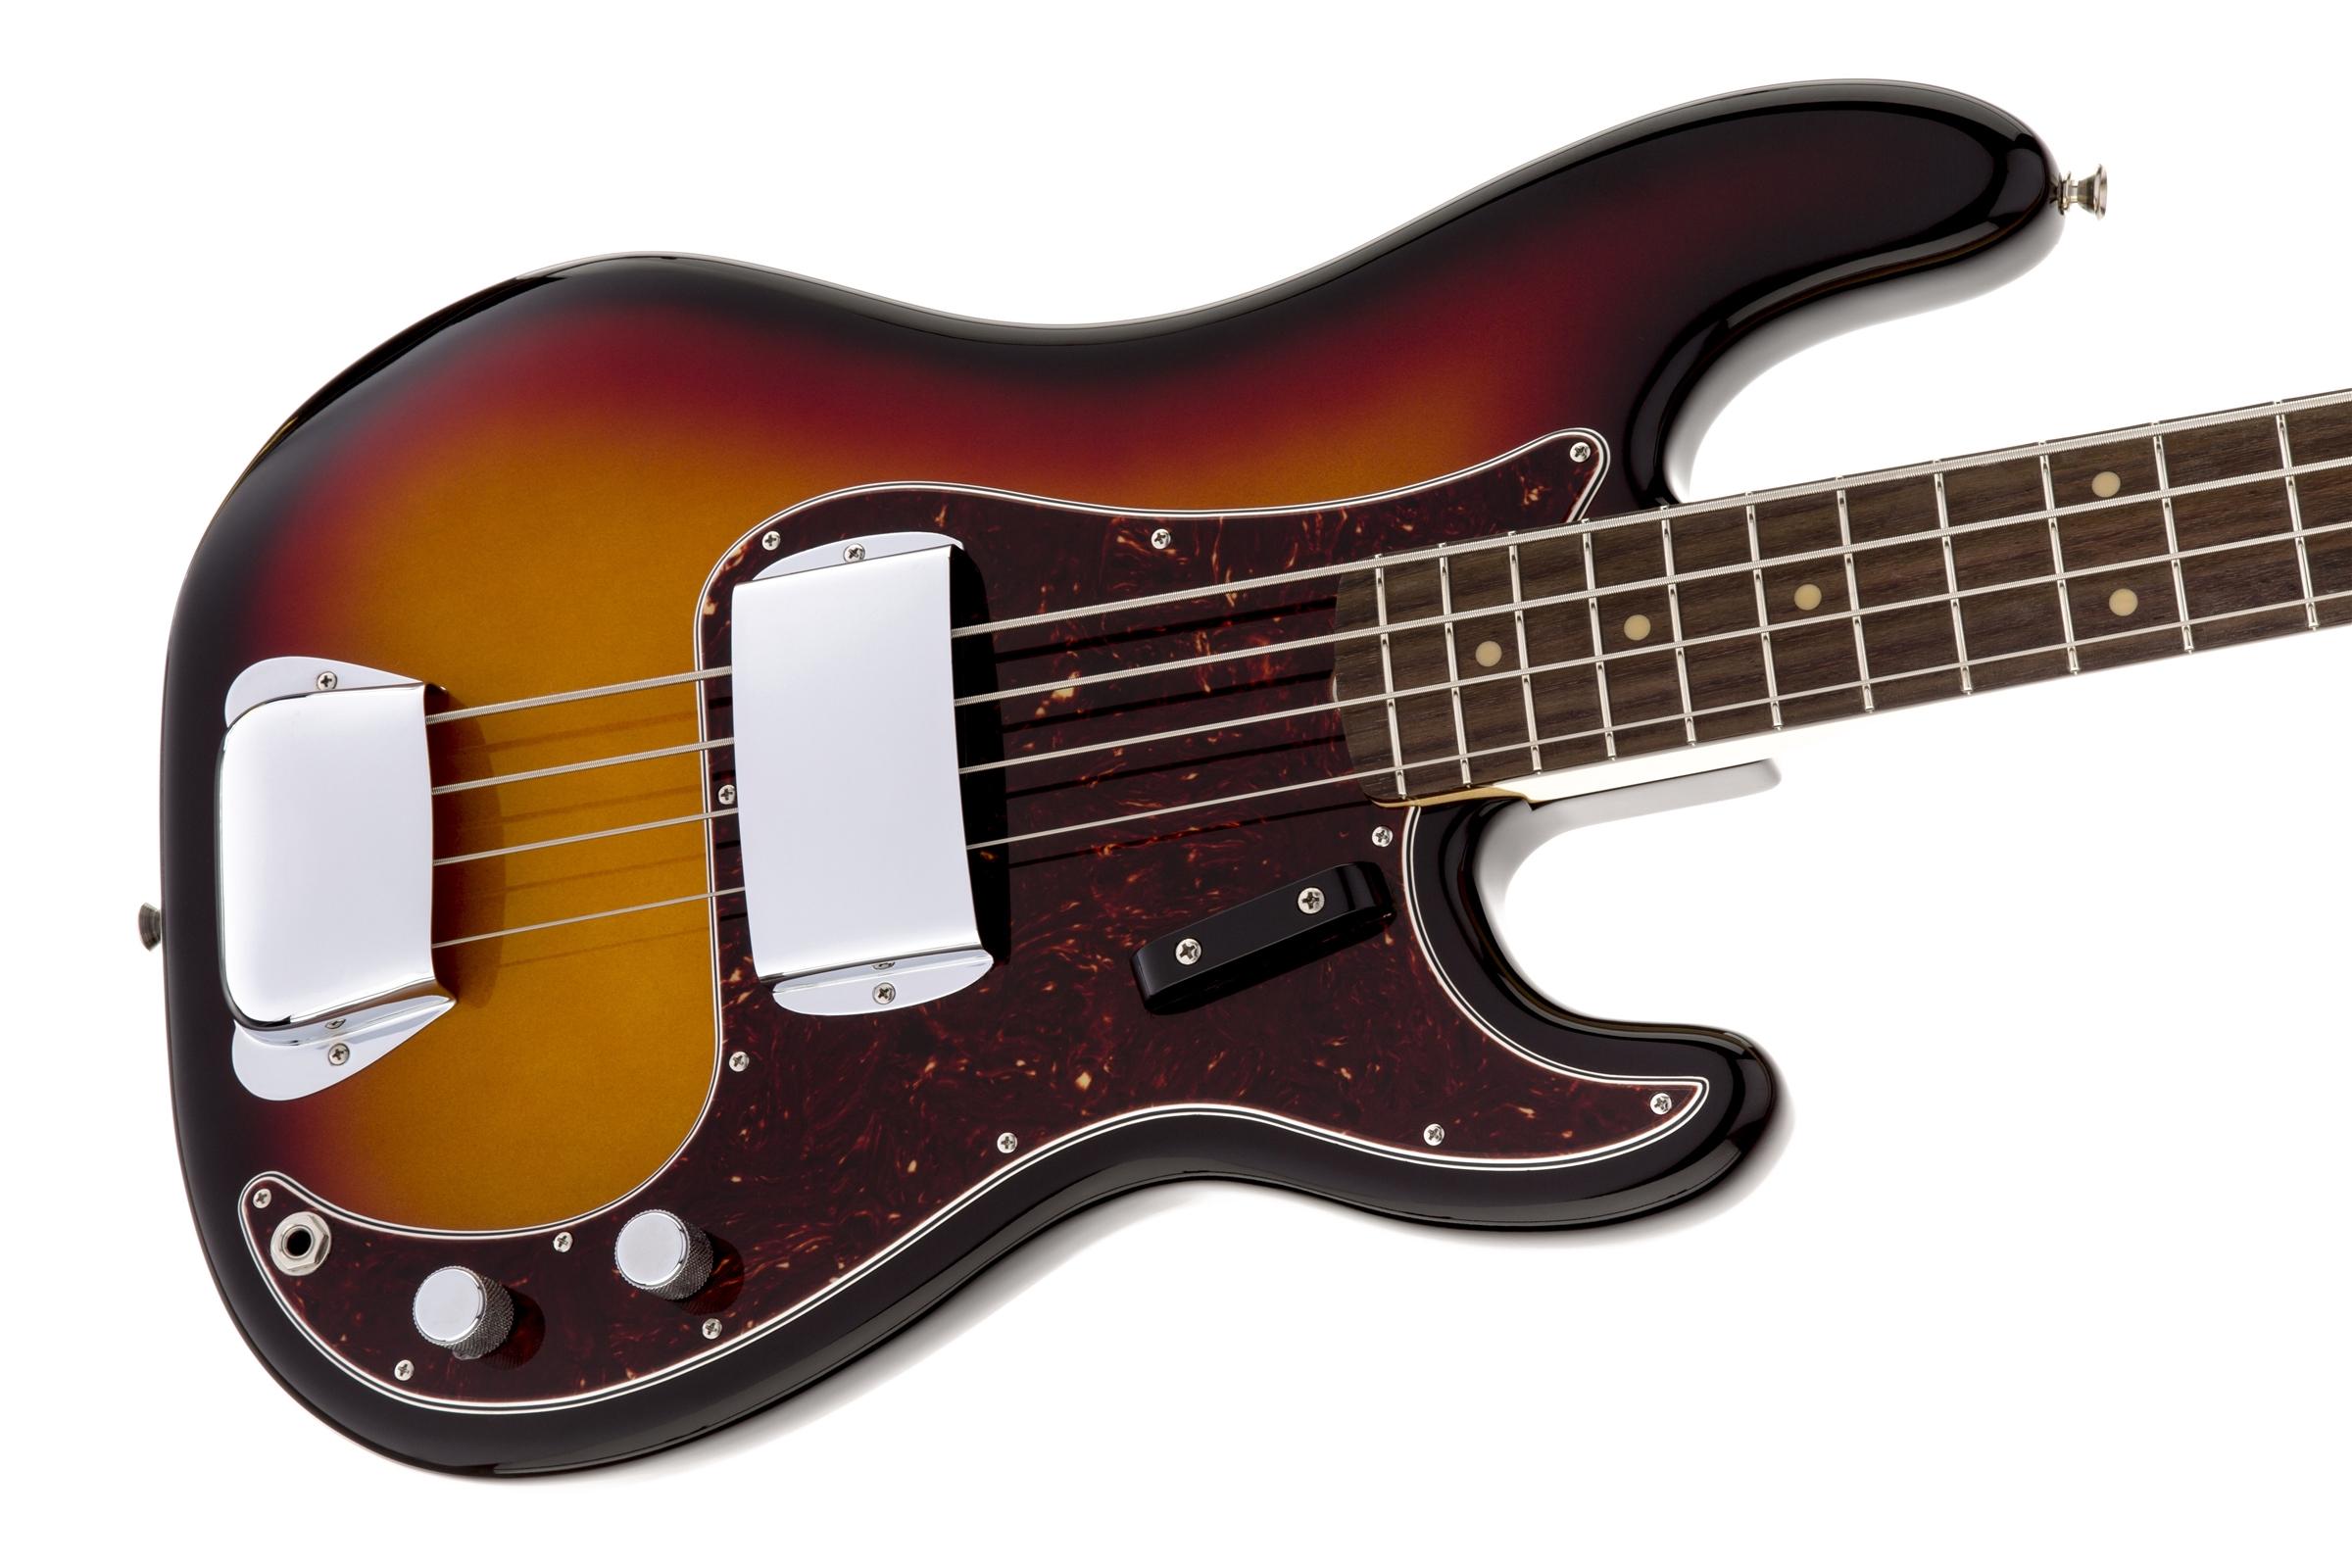 Wiring Diagram Fender Baja Not Lossing Electric Guitar Schematics Pj Bass Telecaster Gibson 1996 272 Diagrams